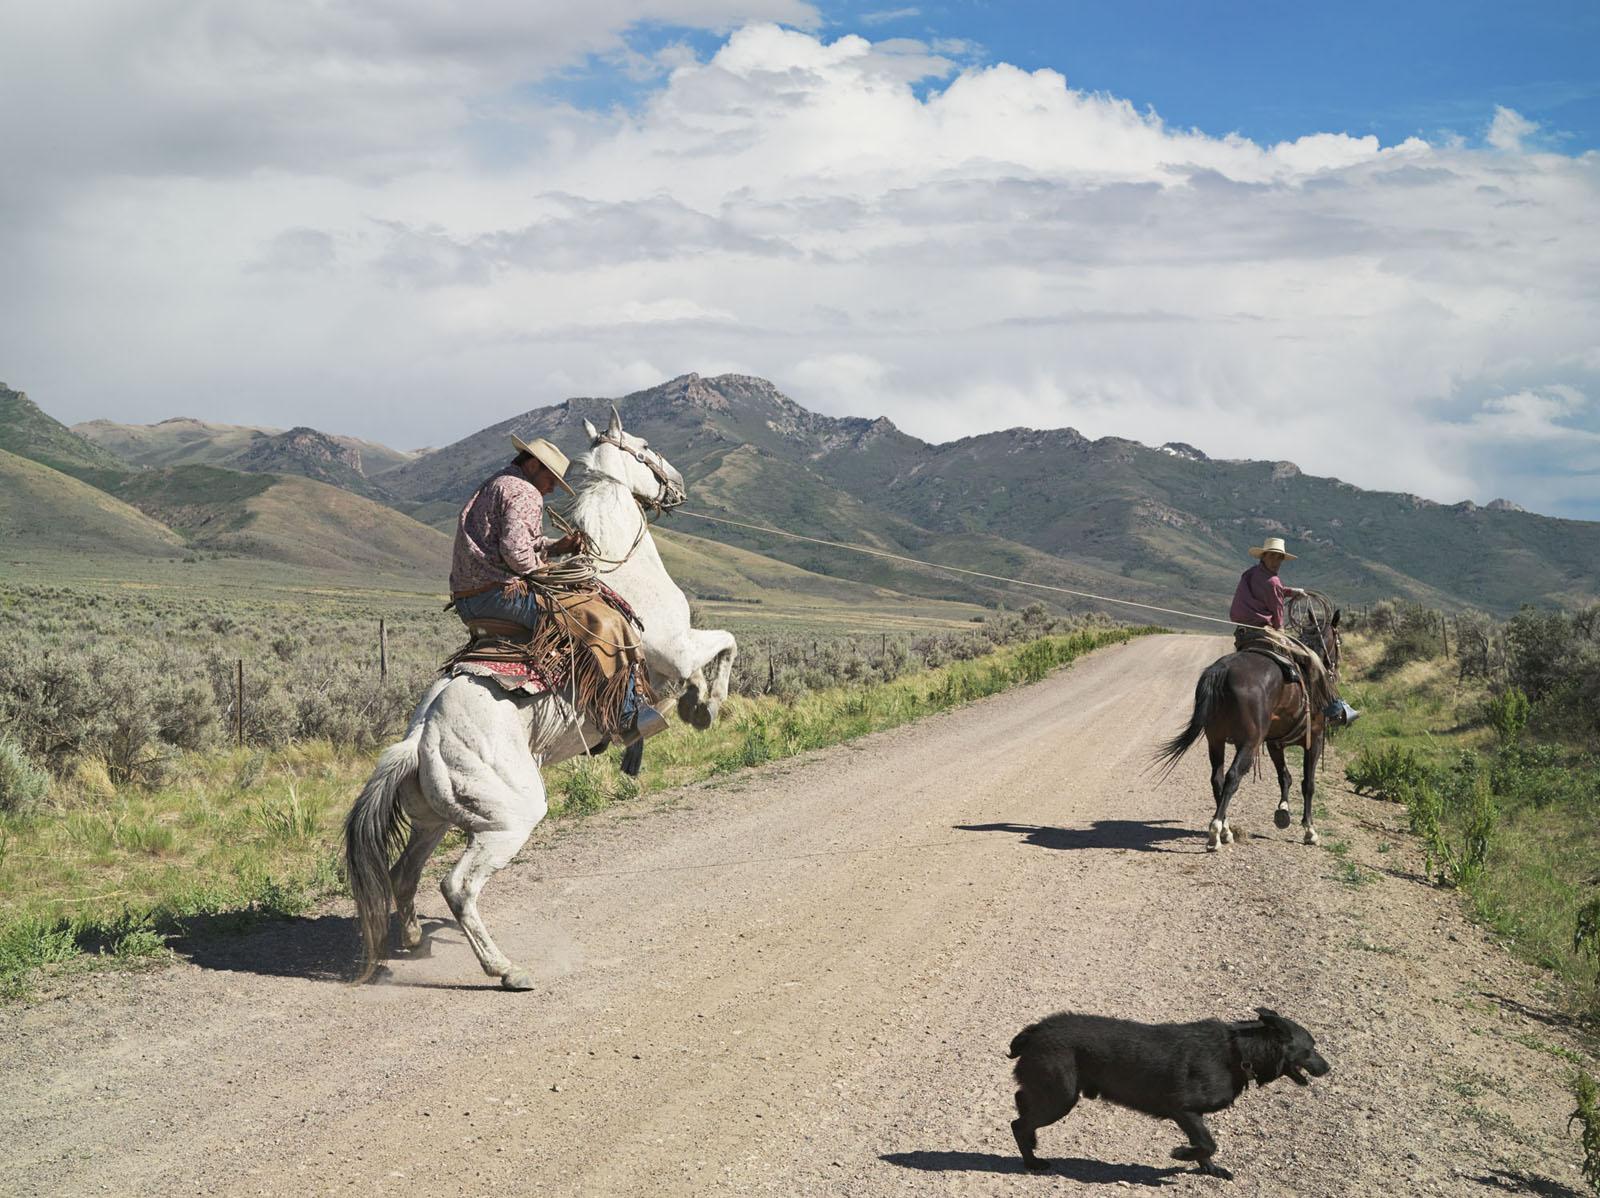 Casey and Rowdy Horse Training, 71 Ranch, Deeth, Nevada, Lucas Foglia, 2012